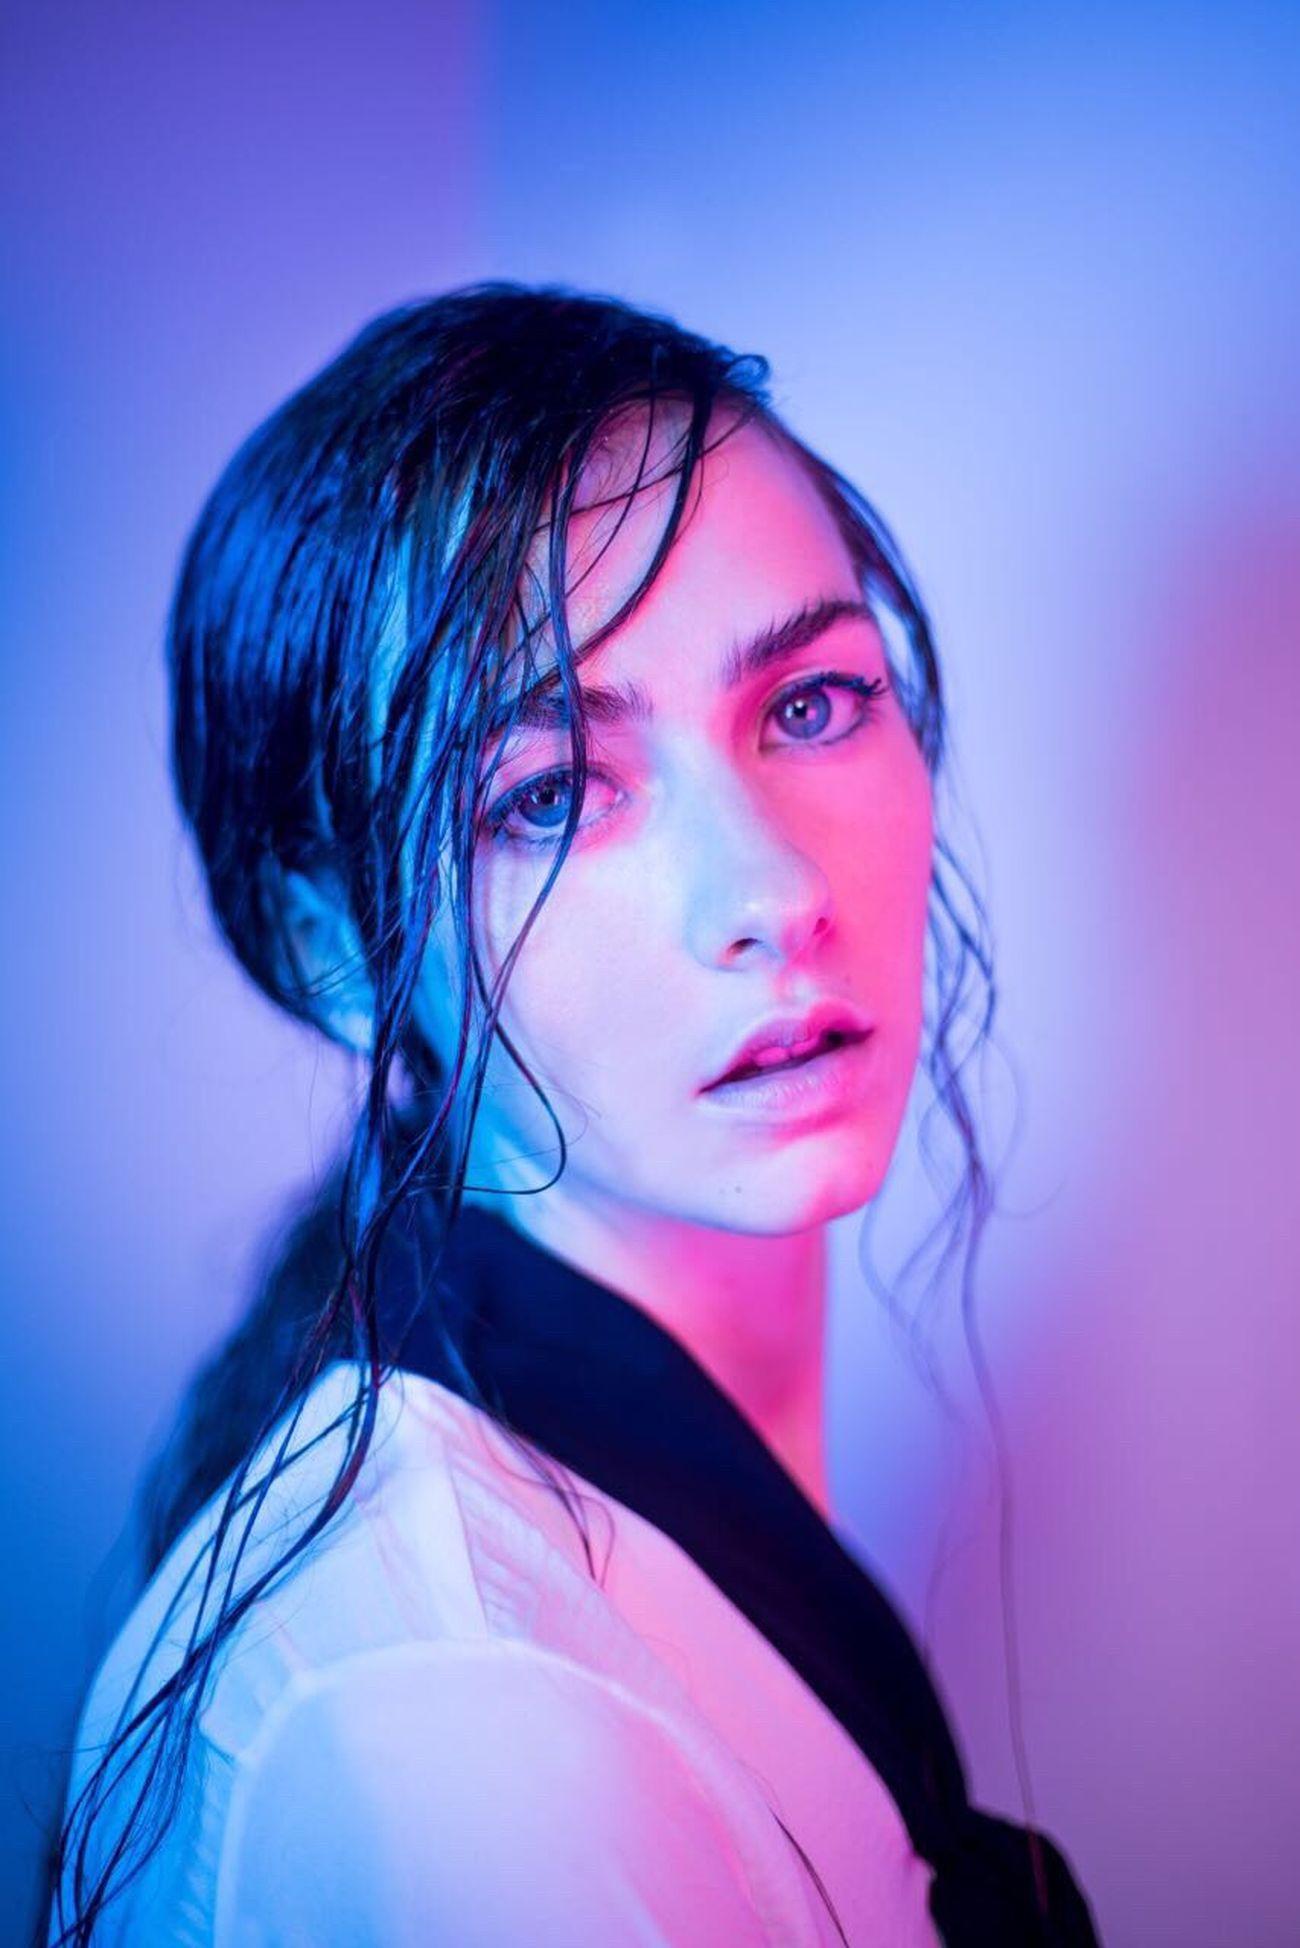 From my: Neon Demon Studio Shot Make-up Portrait Neon Lit Model Women Around The World This Week On Eyeem TheWeekOnEyeEM